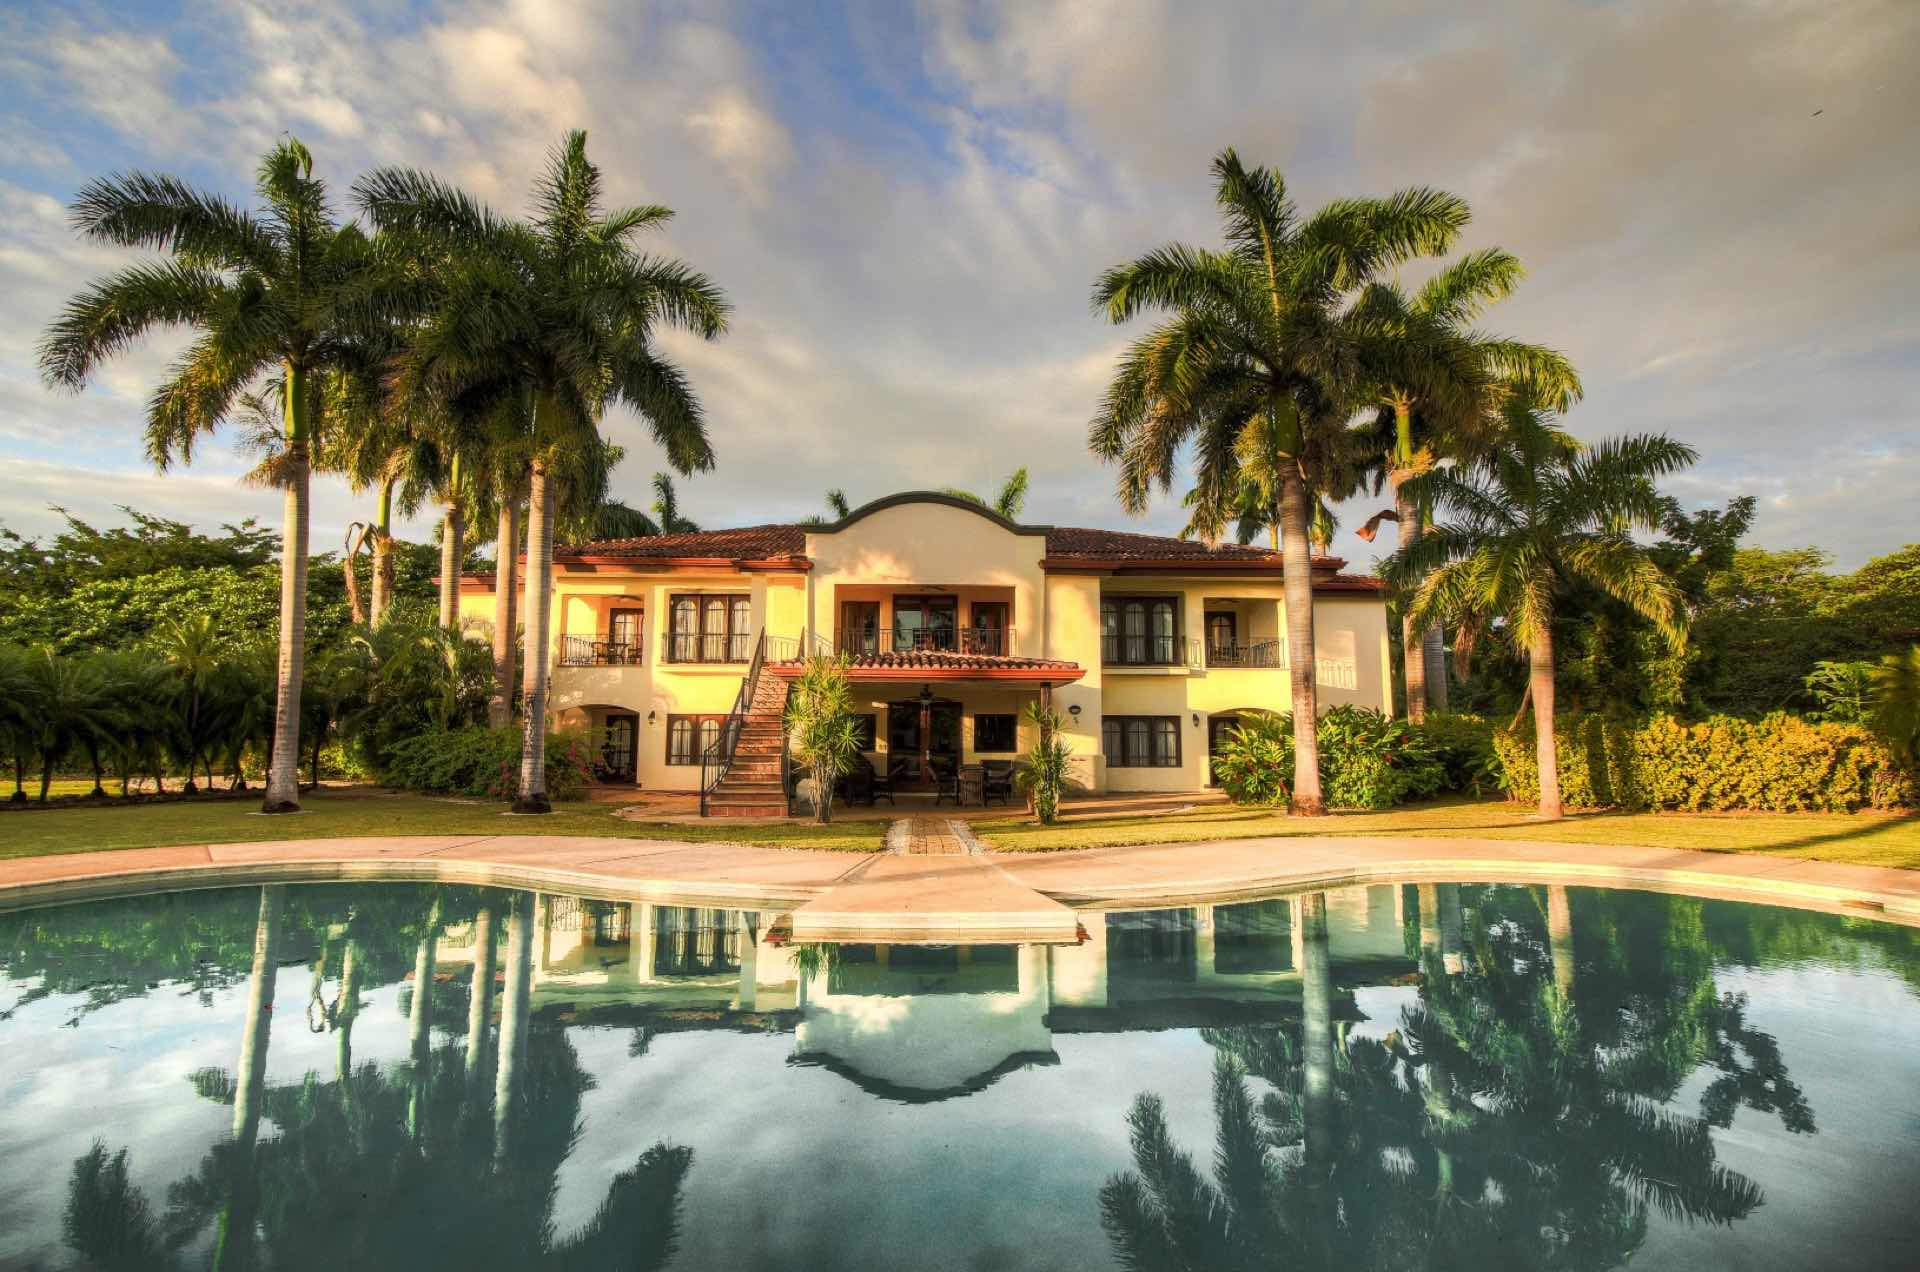 Villa Tranquila Costa Rica wedding venues